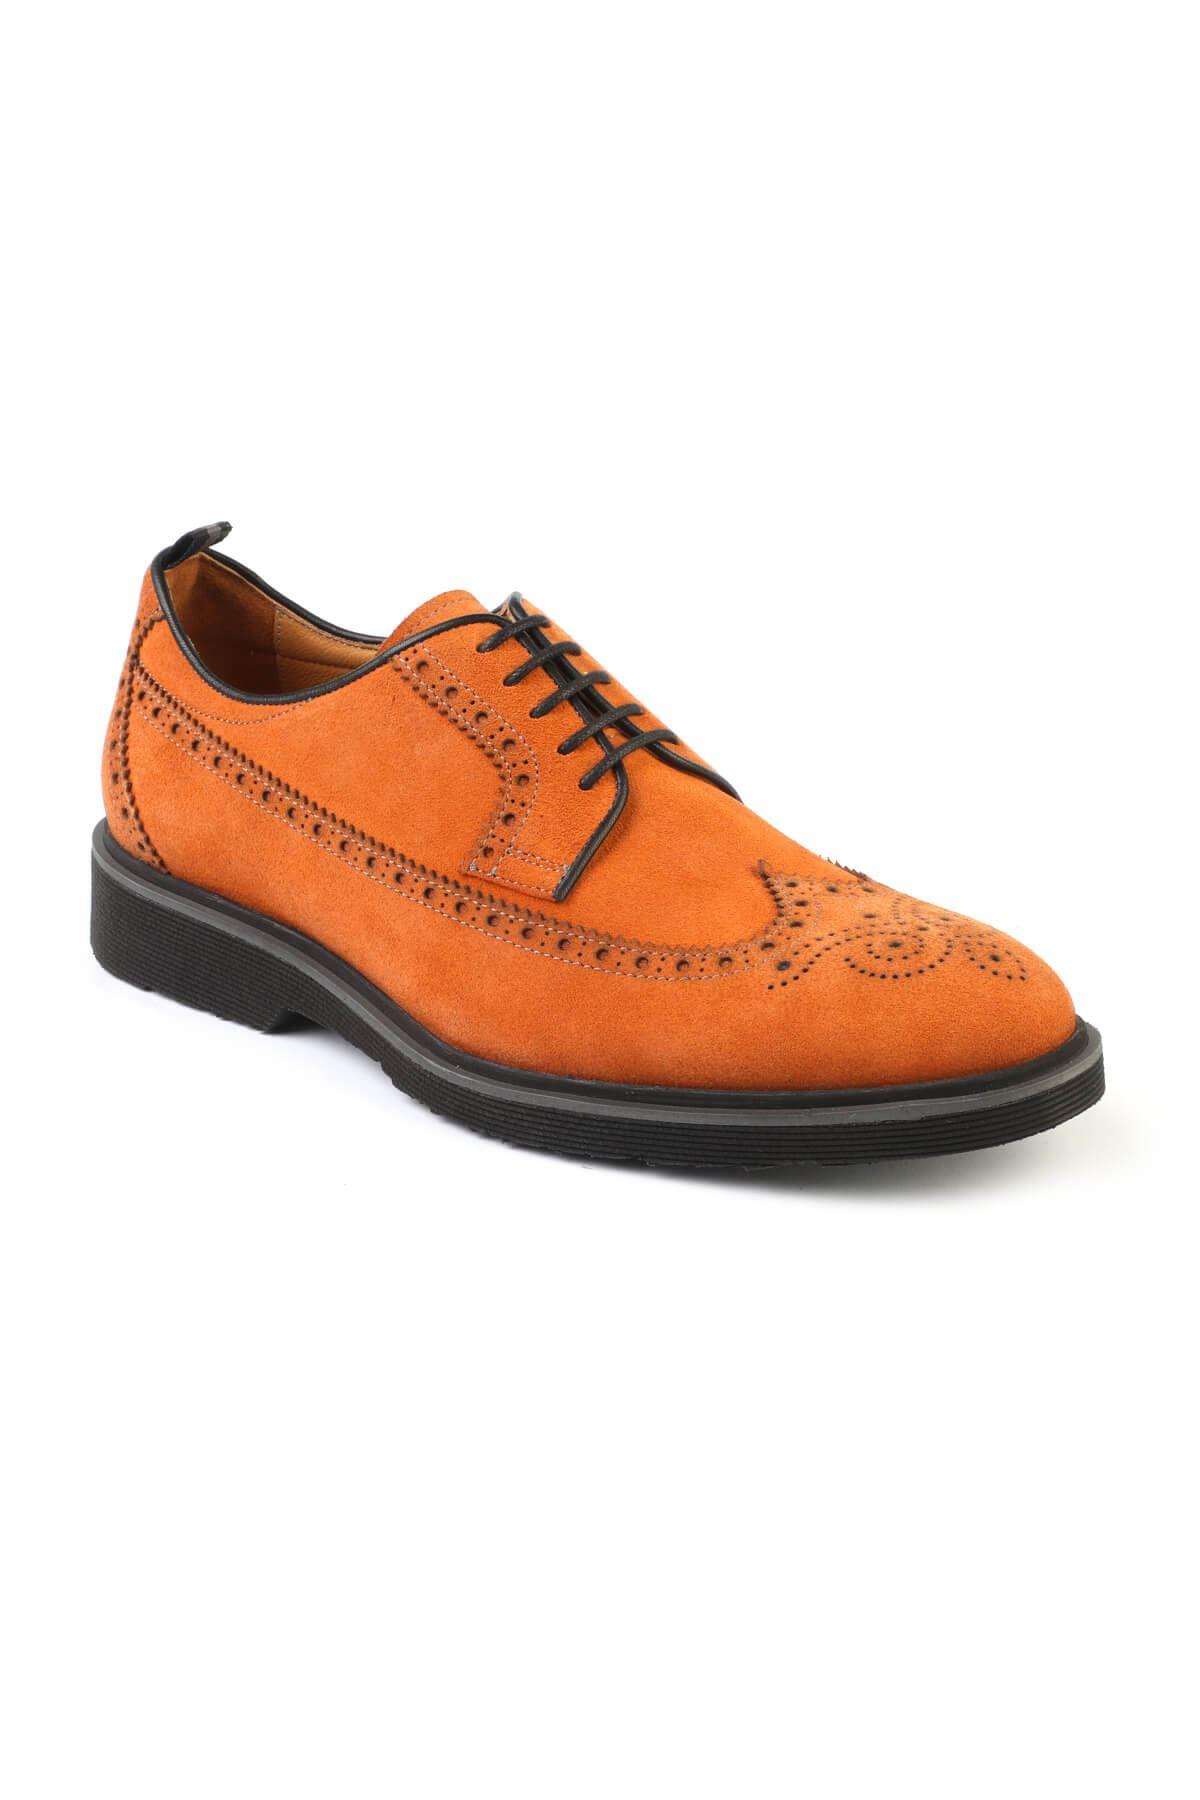 Libero T1309 Orange Oxford Shoes